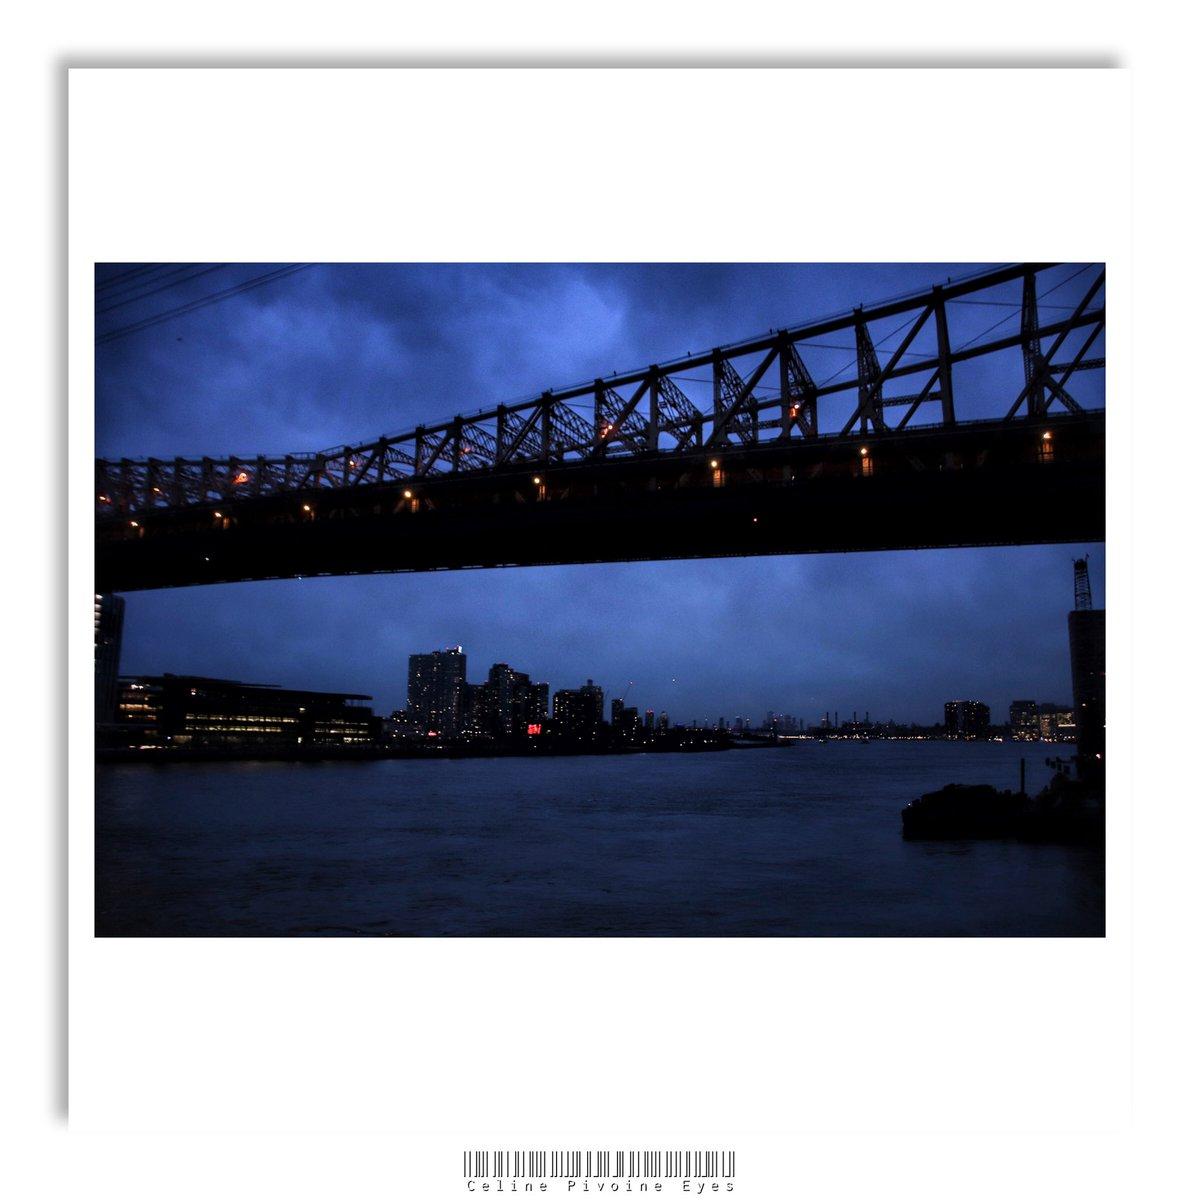 Vue de ponts à la tombée du jour in NYC . . . #newyork #newyorkcity #NYC #city #ville #voyage #paysageurbain #bigapple #icapture_nyc #newyorknewyork #nycityworld #streetsofnewyork #unlimited_newyork #photo #photographer #photographe #urbain #artmajeur #etudiantip #pont #sunsetpic.twitter.com/afn9ITkSex